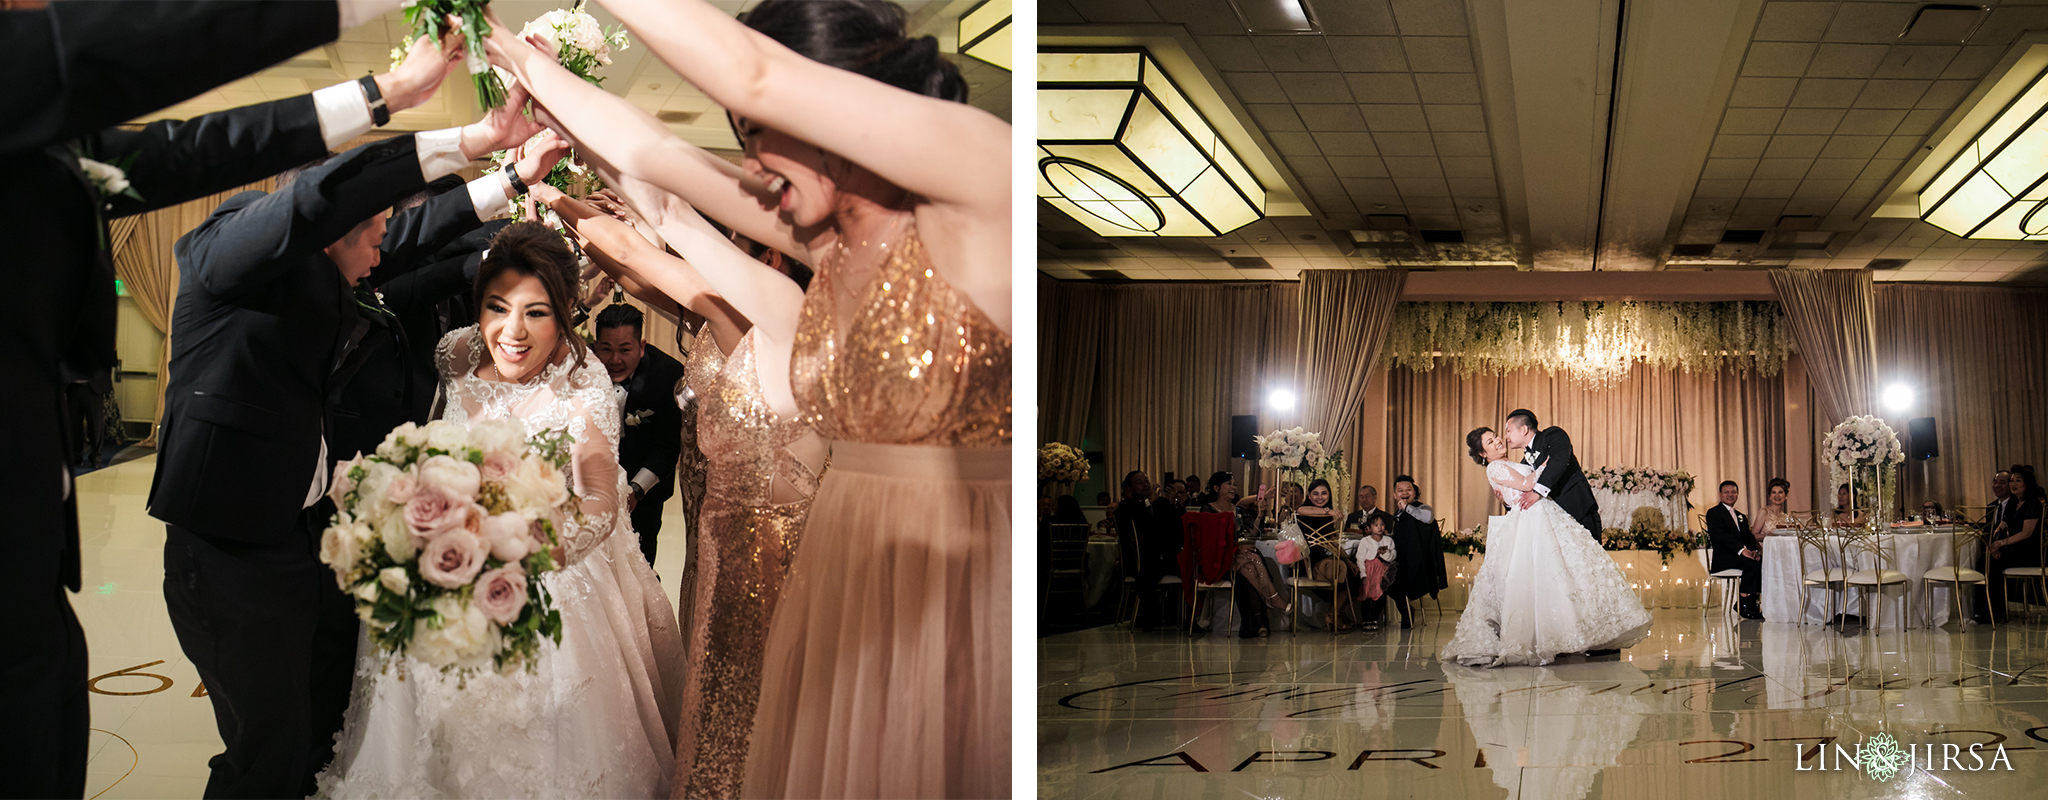 24 The Newport Beach Marriott Hotel Wedding Photography